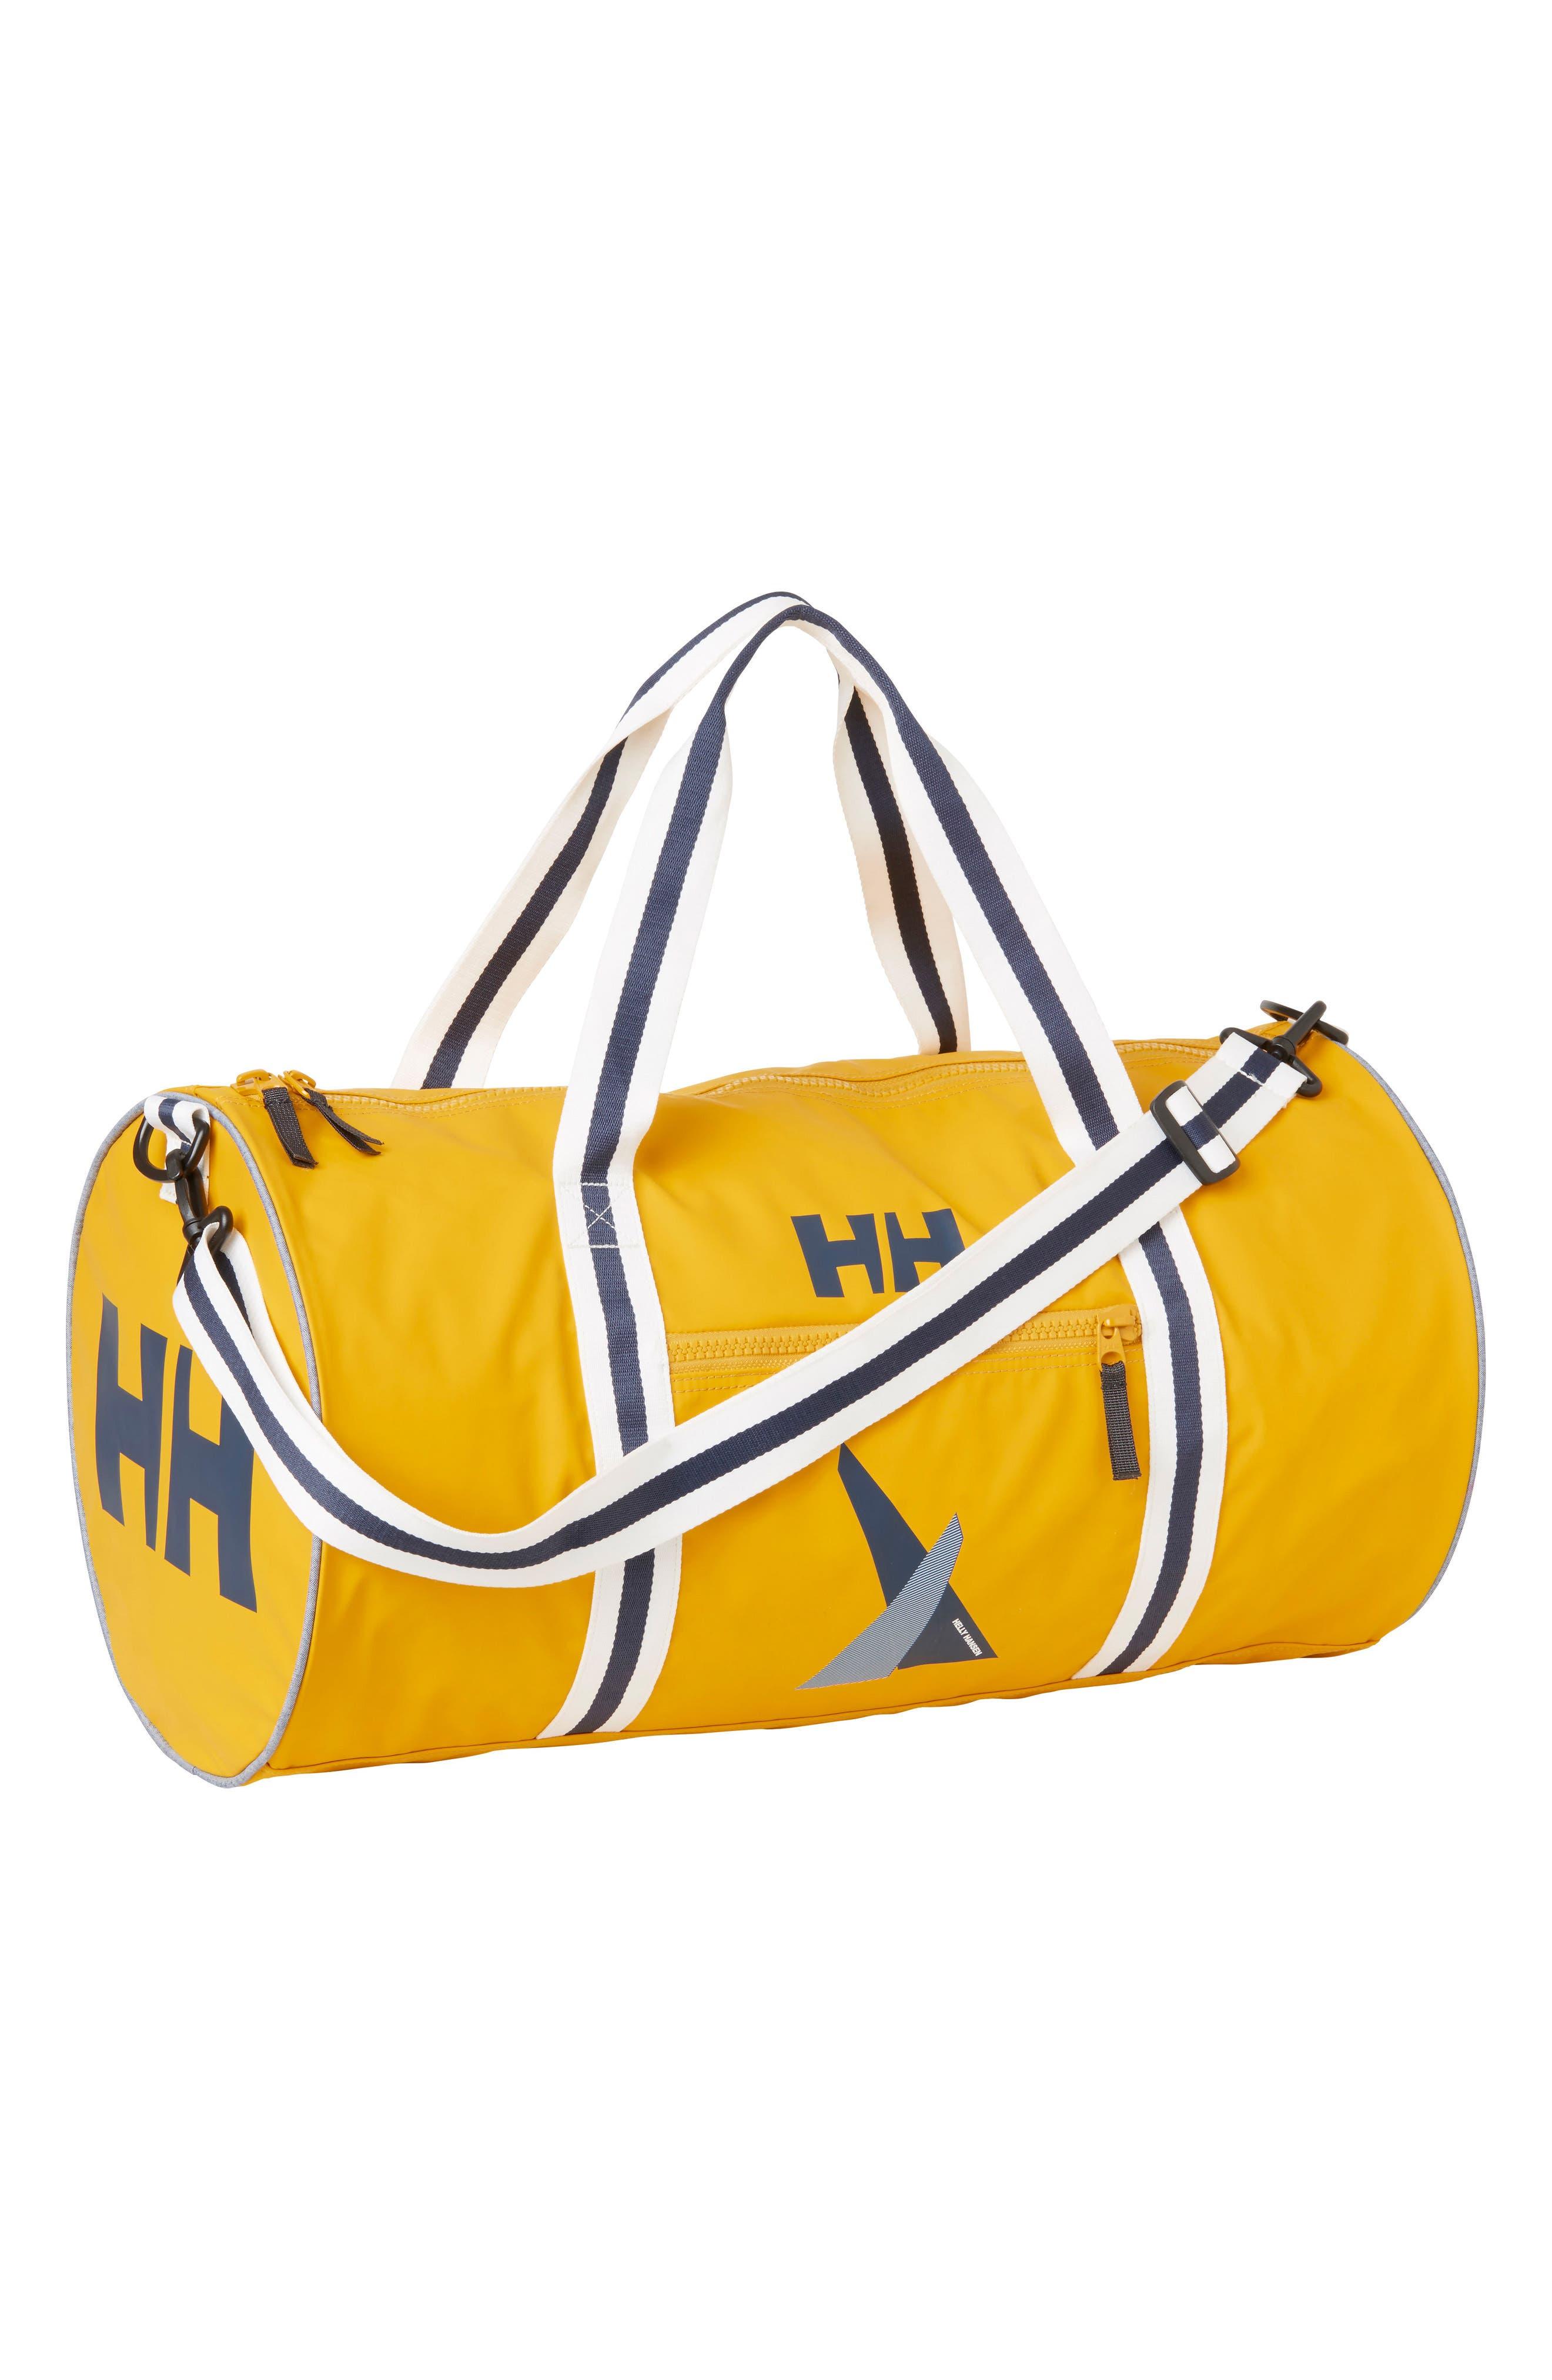 Helly Hansen Travel Beach Bag